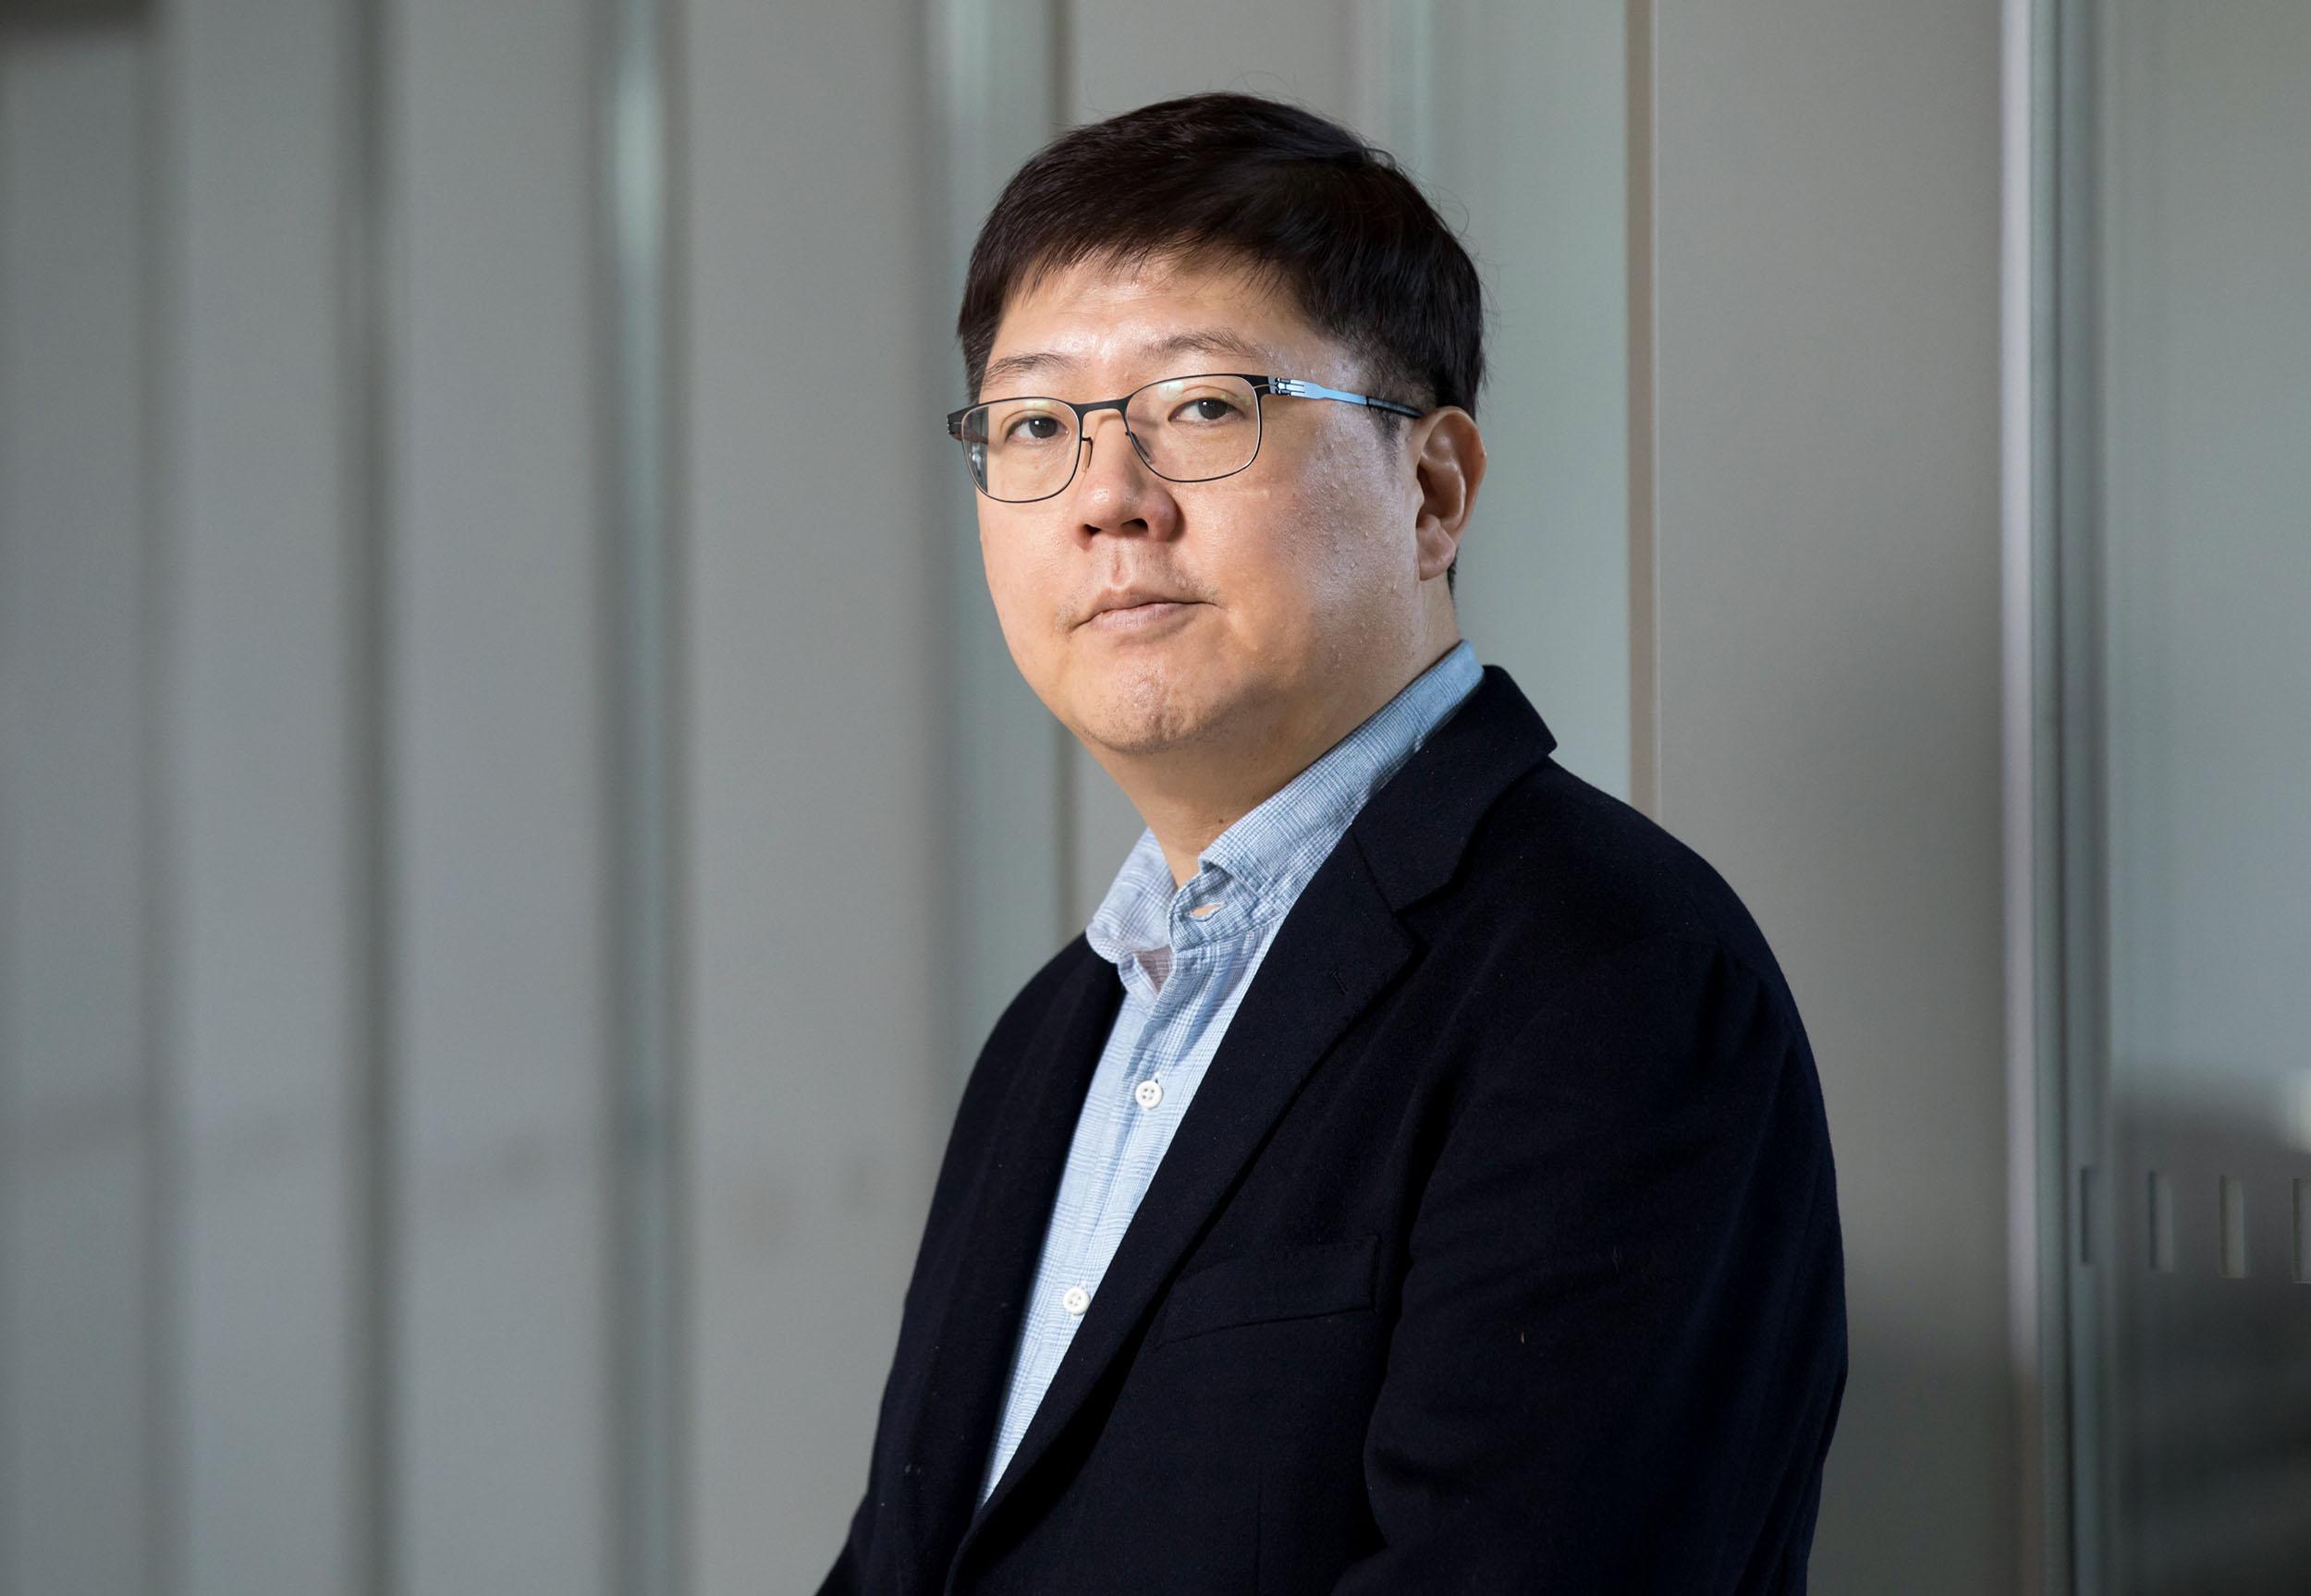 Image: Kim Hong-gul hopes to have good news in 2018.